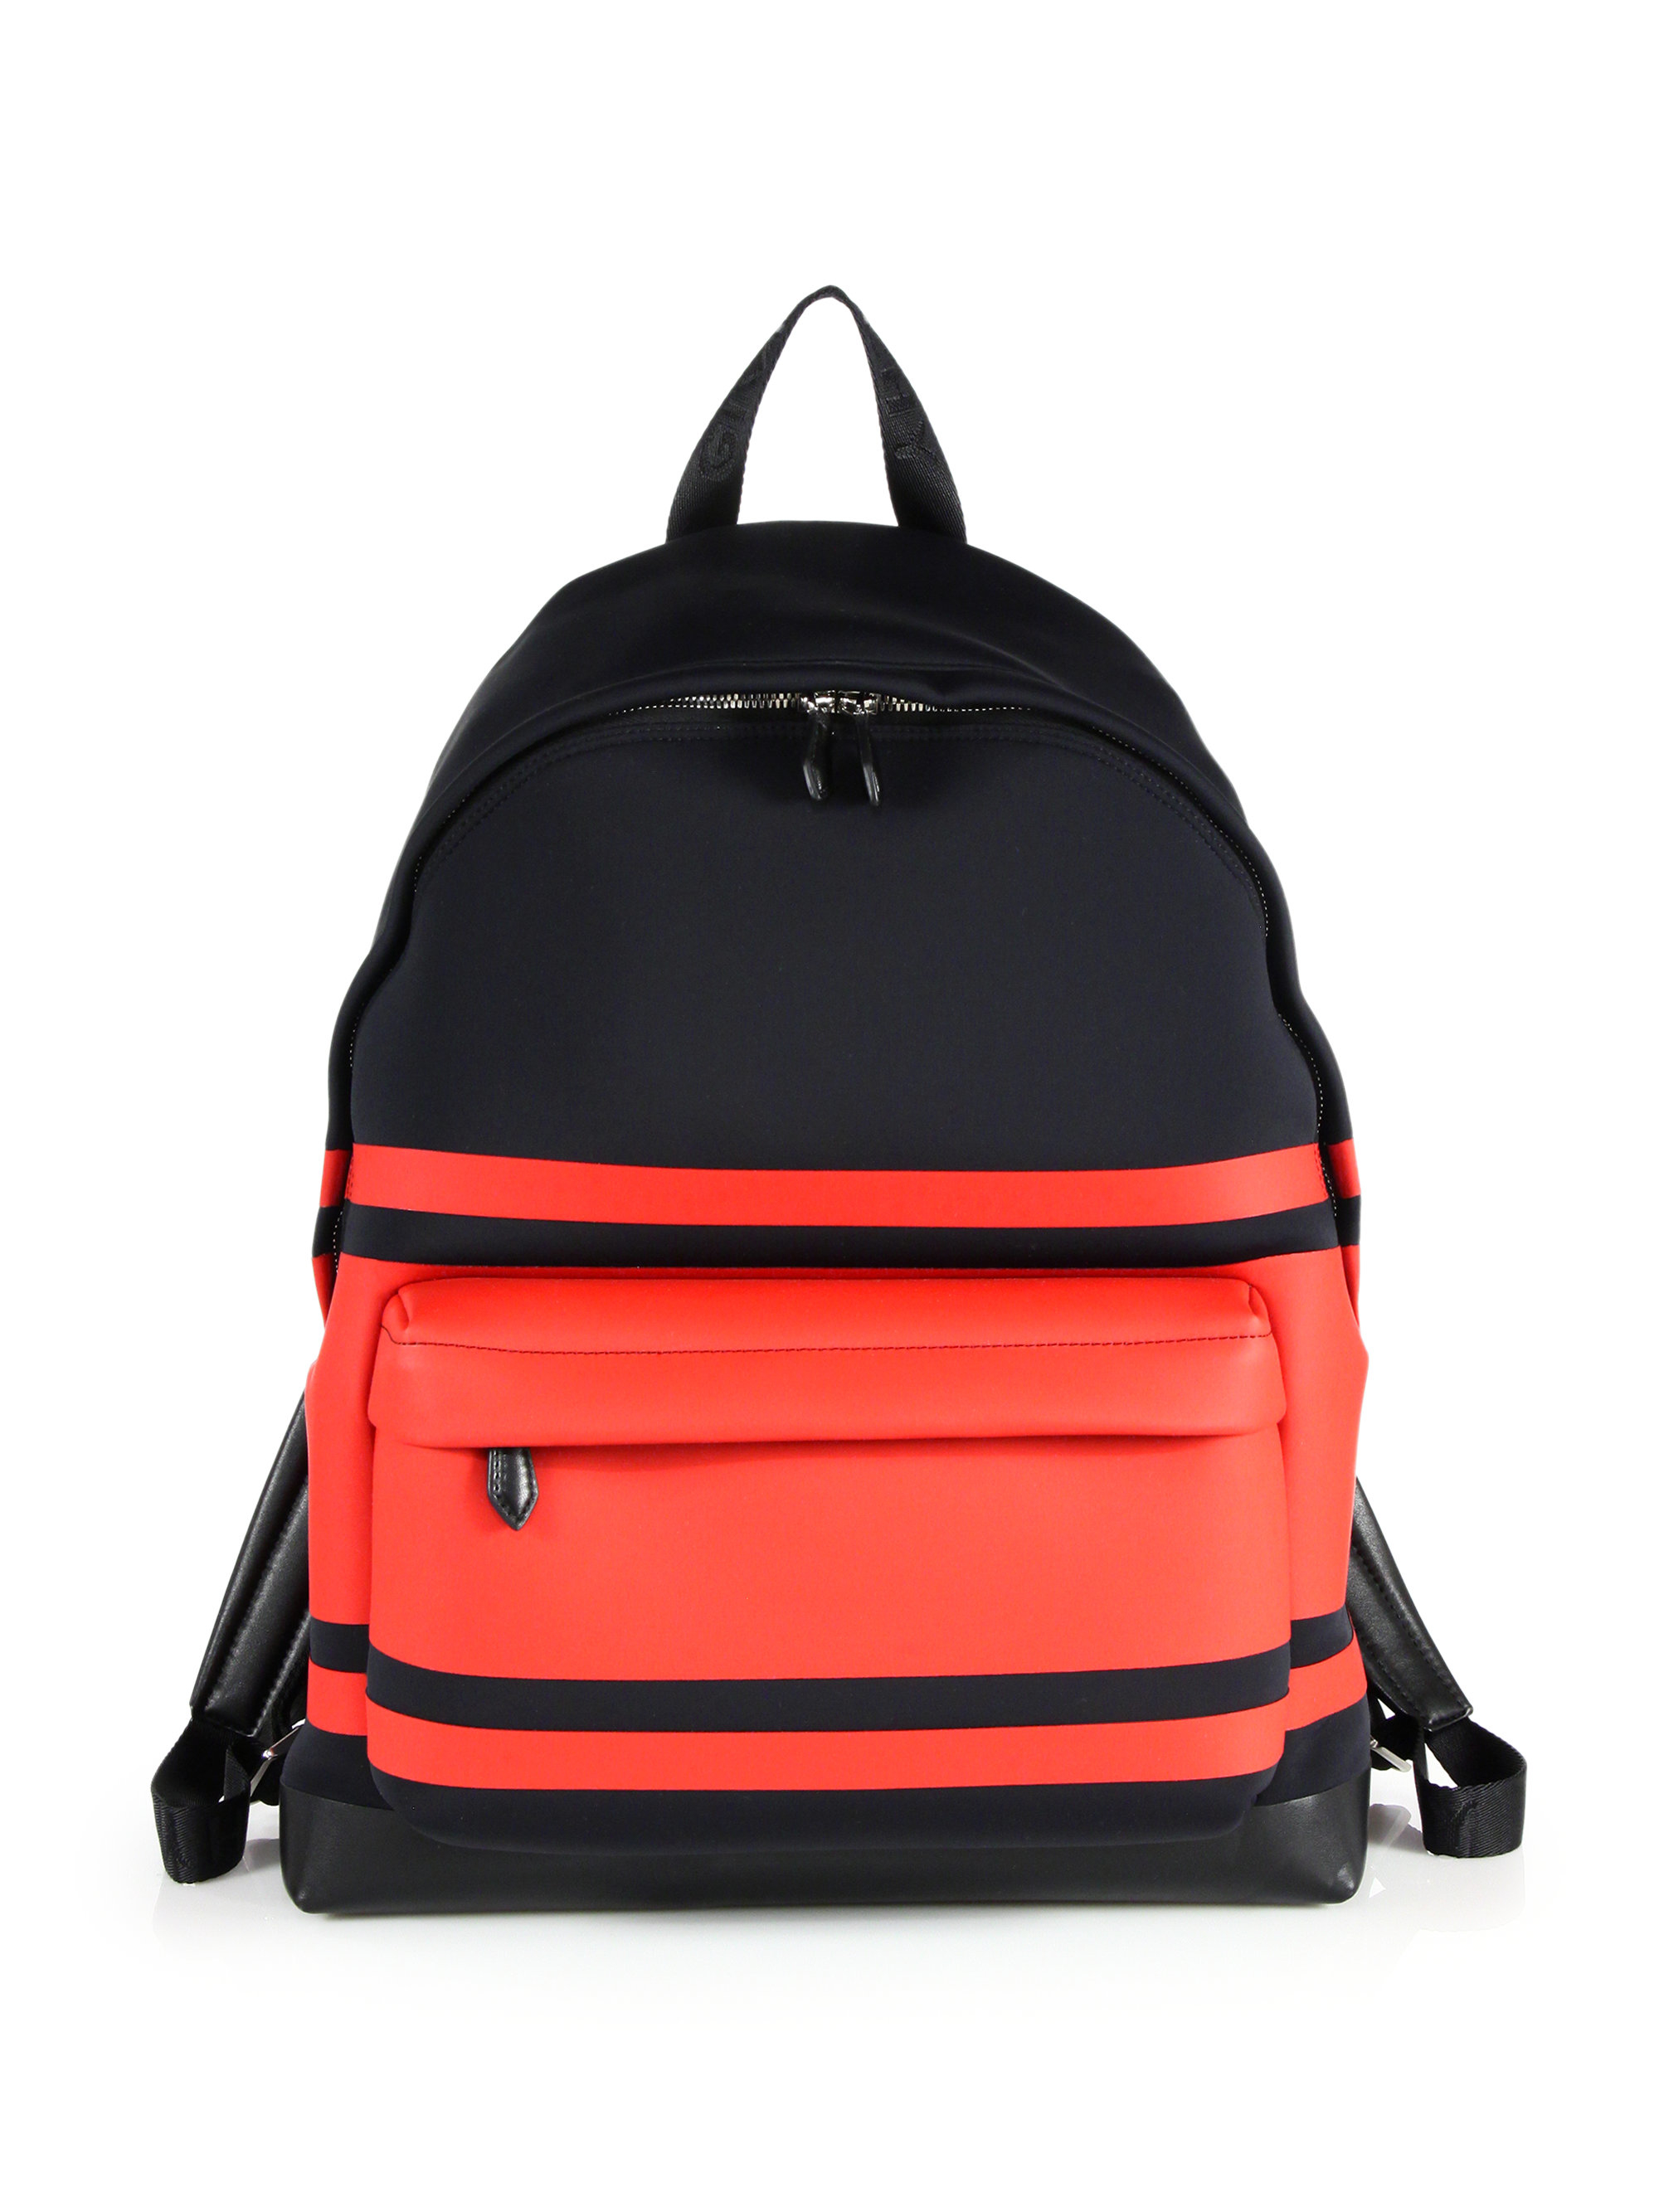 b4ef6f9fcccc Lyst - Givenchy Striped Neoprene Backpack in Black for Men